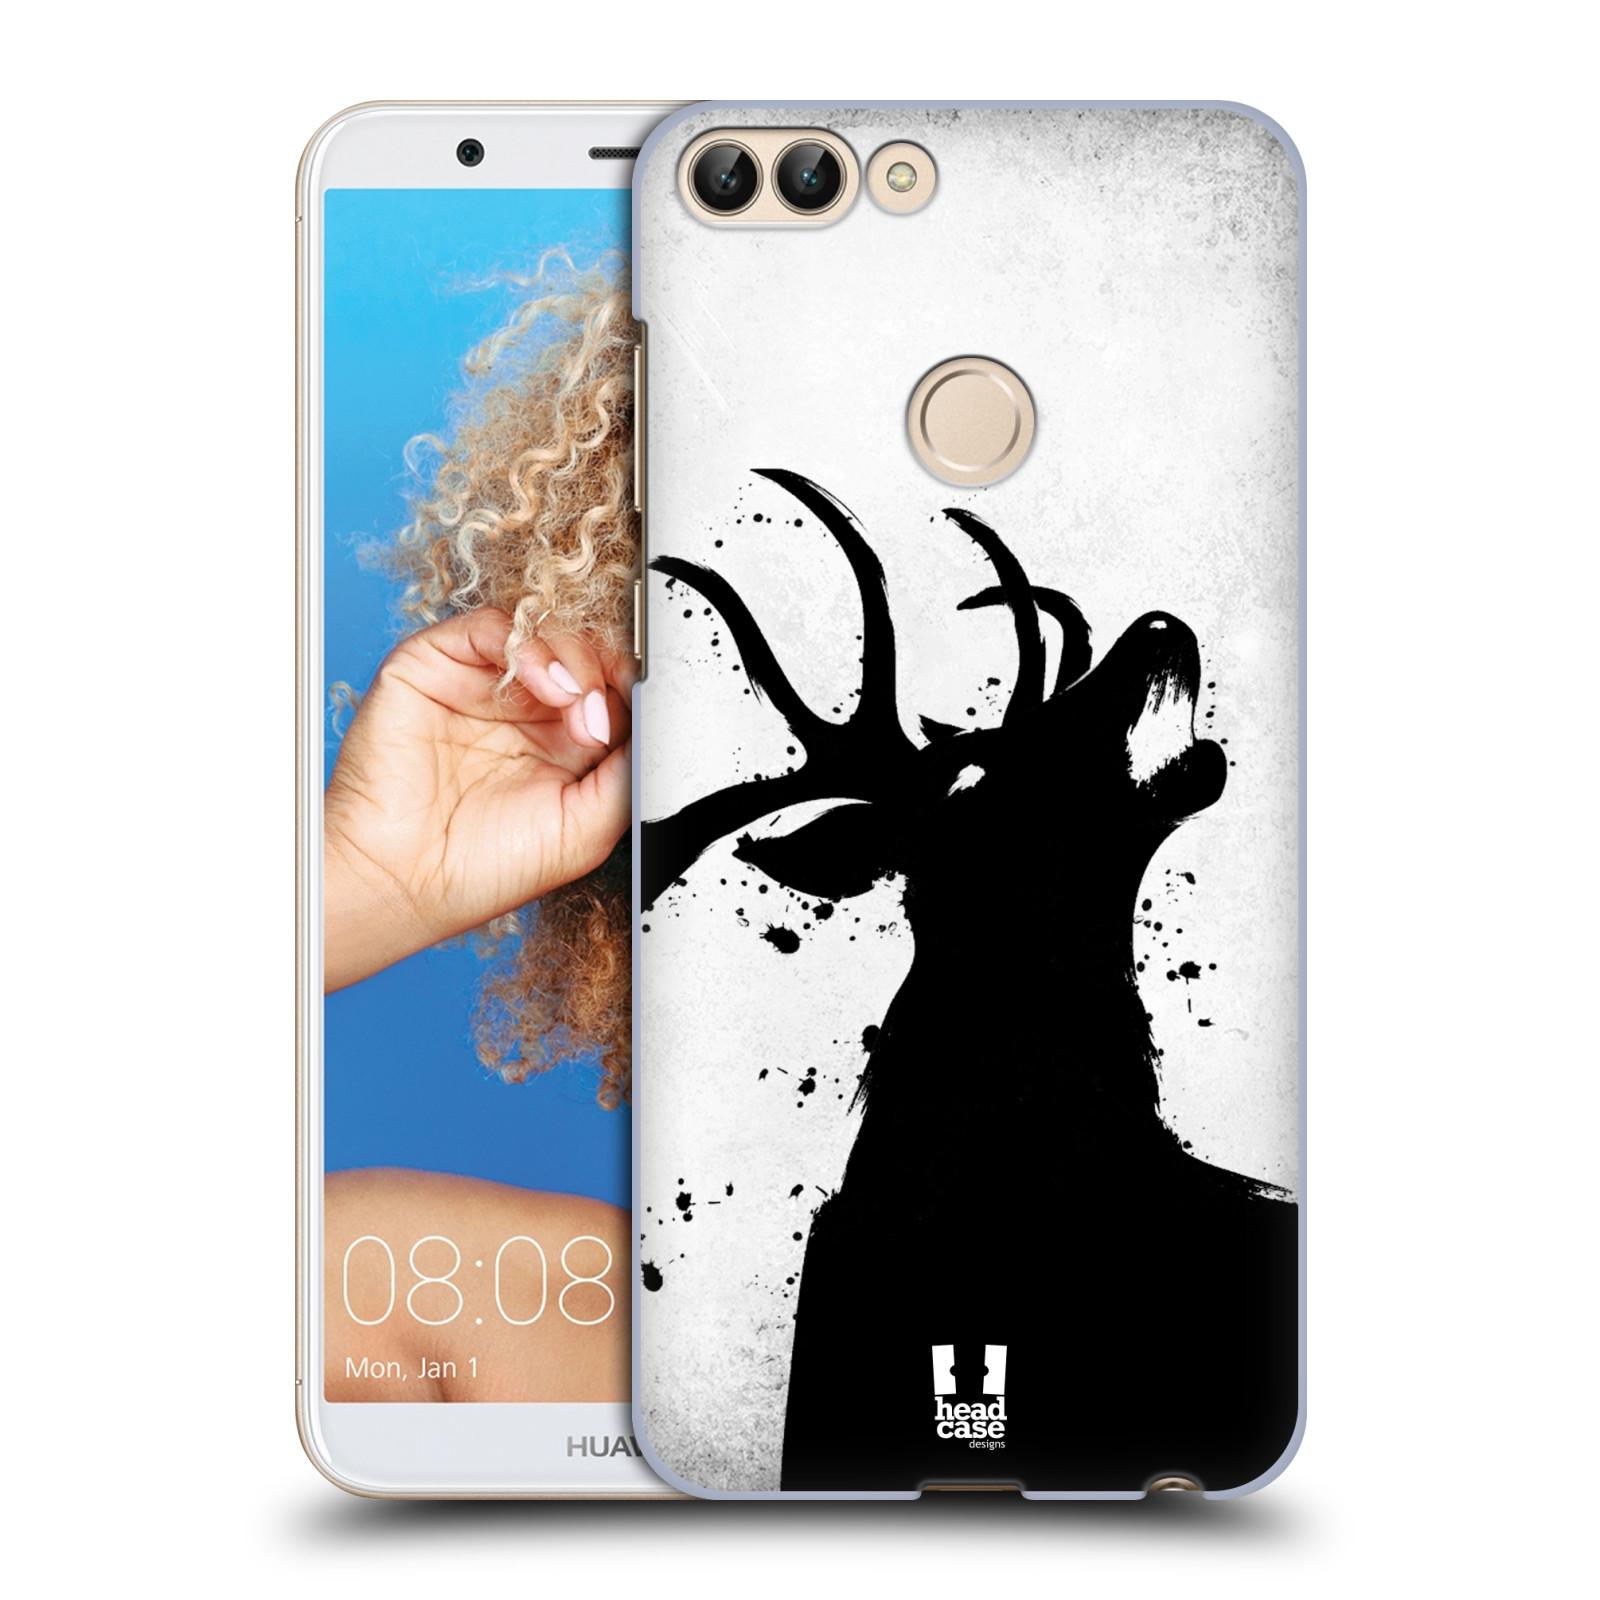 HEAD CASE plastový obal na mobil Huawei P Smart vzor Kresba tuš zvíře jelen